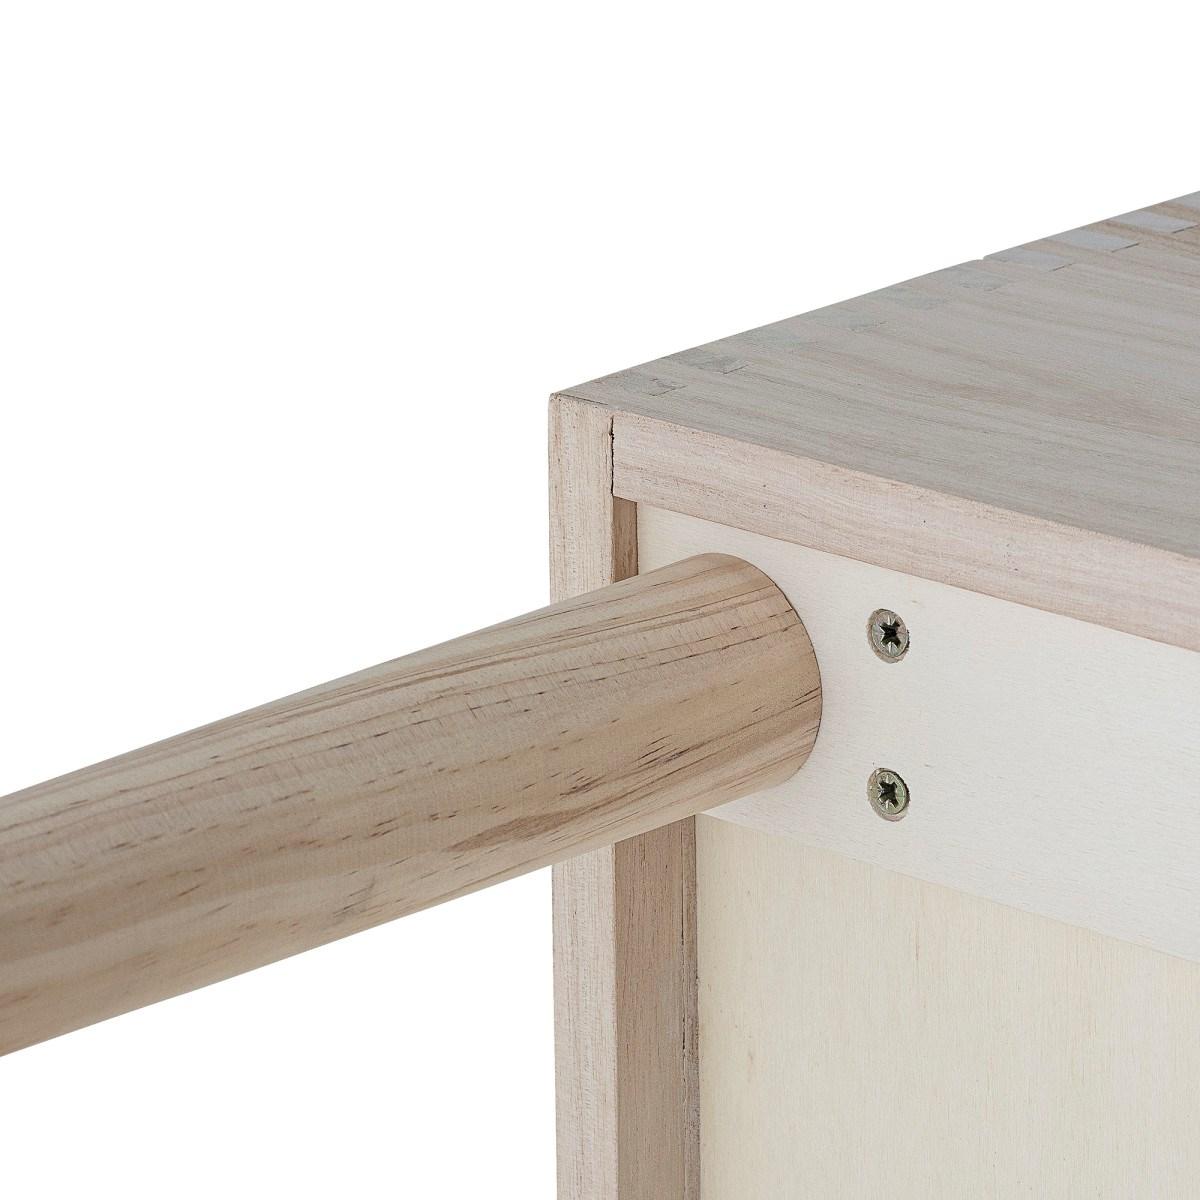 Dřevěná knihovna 91xV.50x35 cm_5